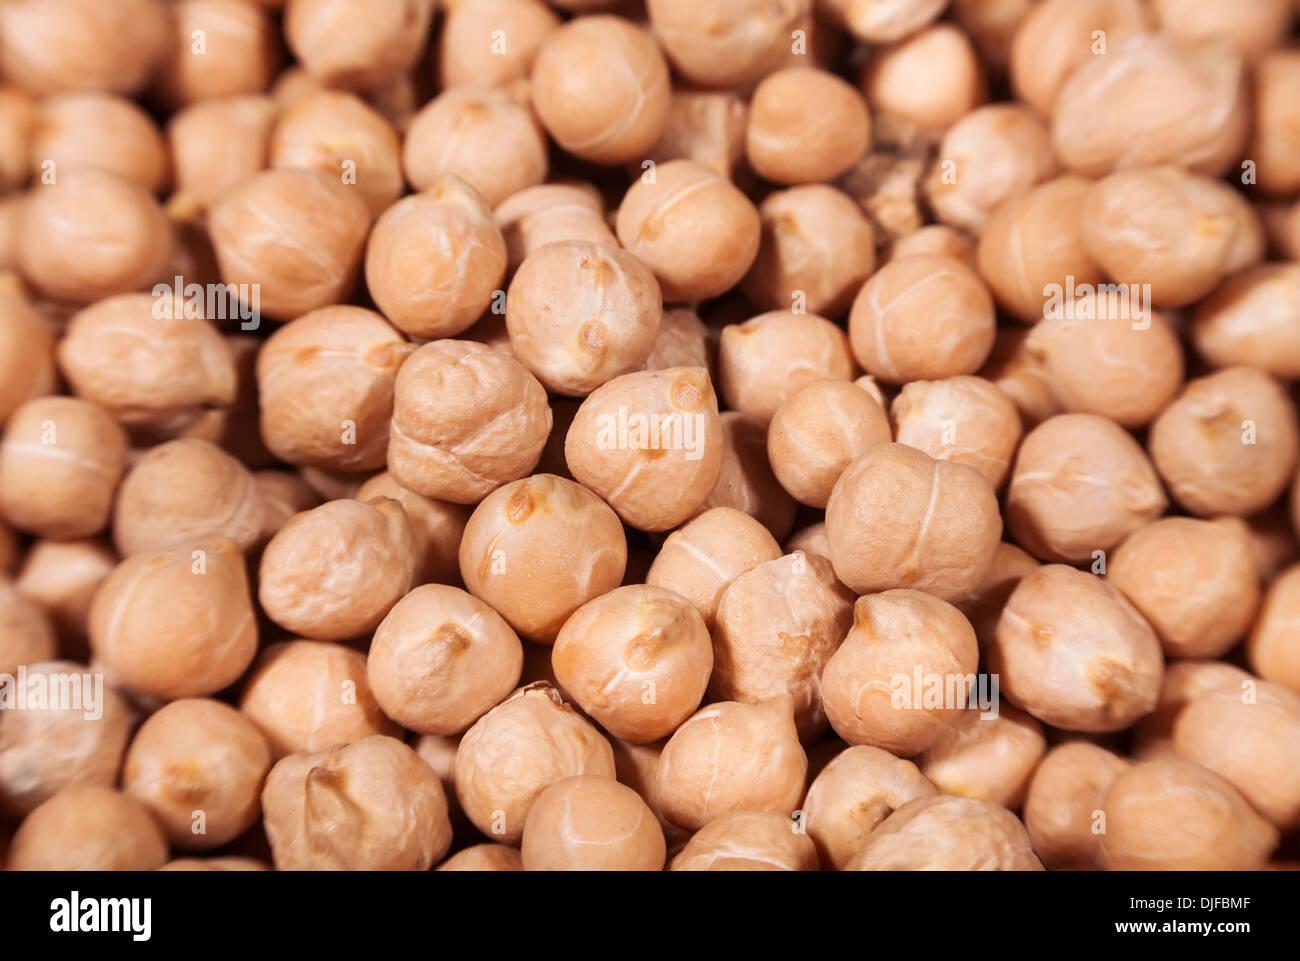 peas closeup many textured blur - Stock Image